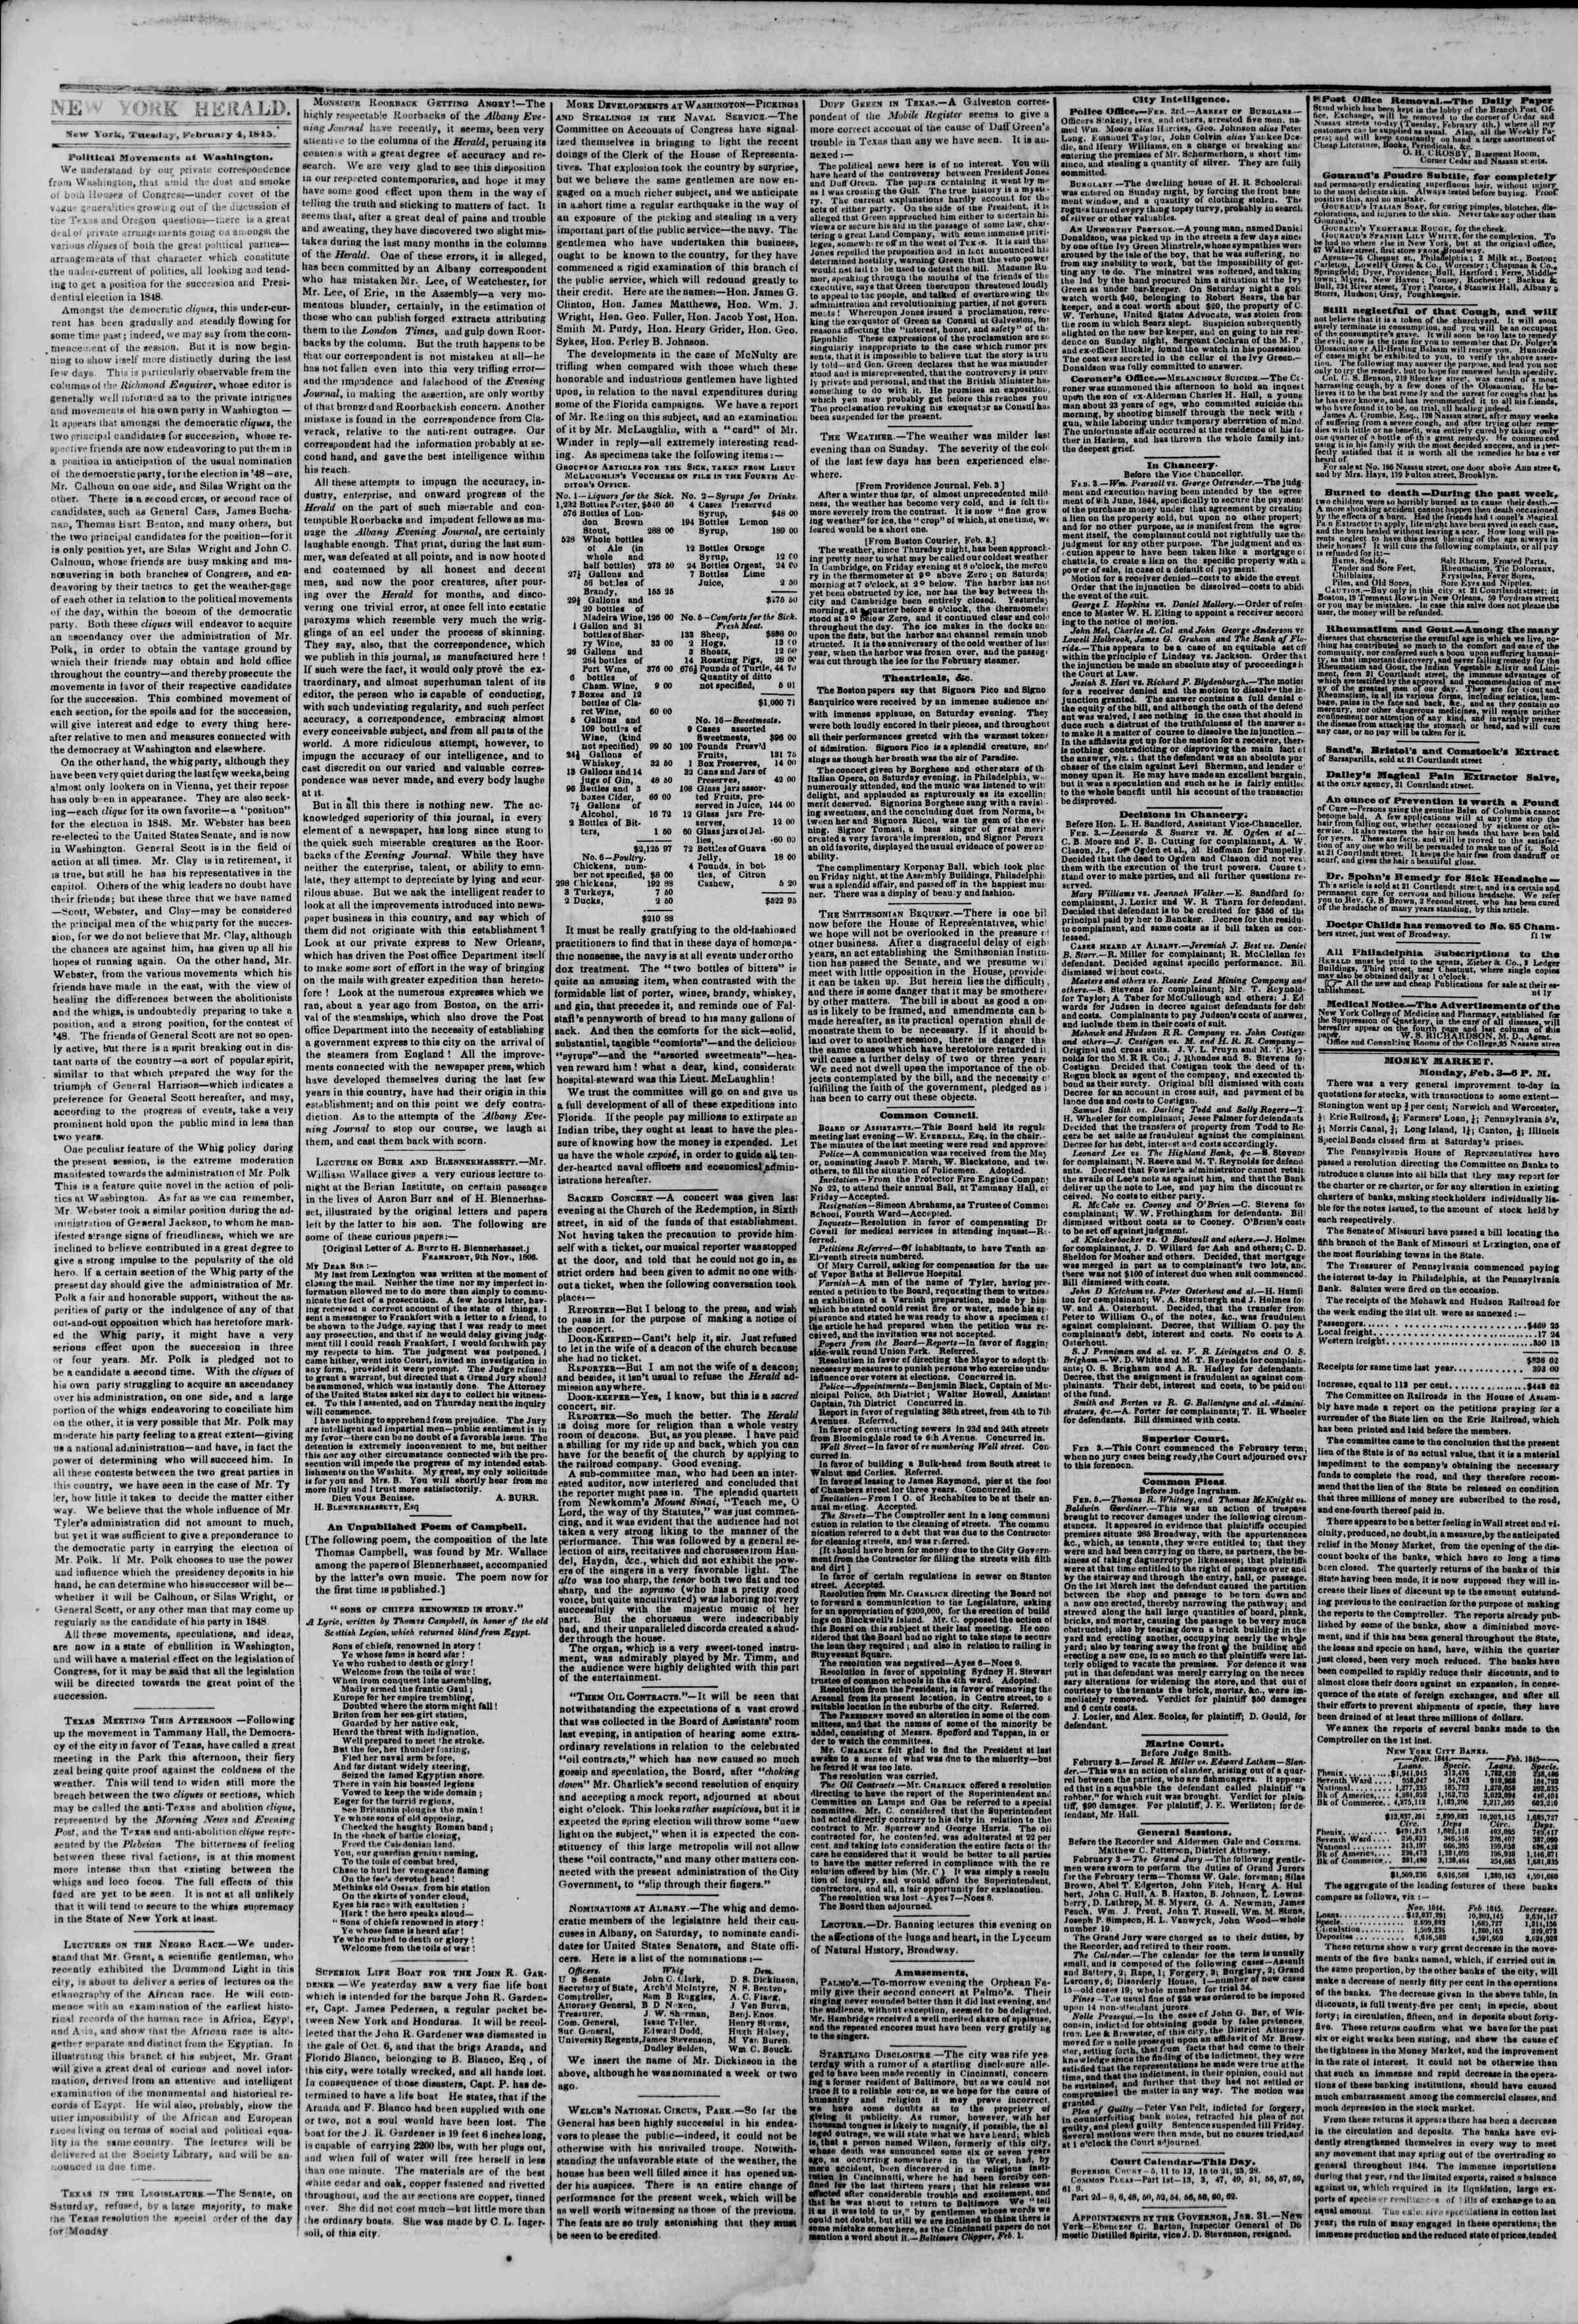 February 4, 1845 Tarihli The New York Herald Gazetesi Sayfa 2